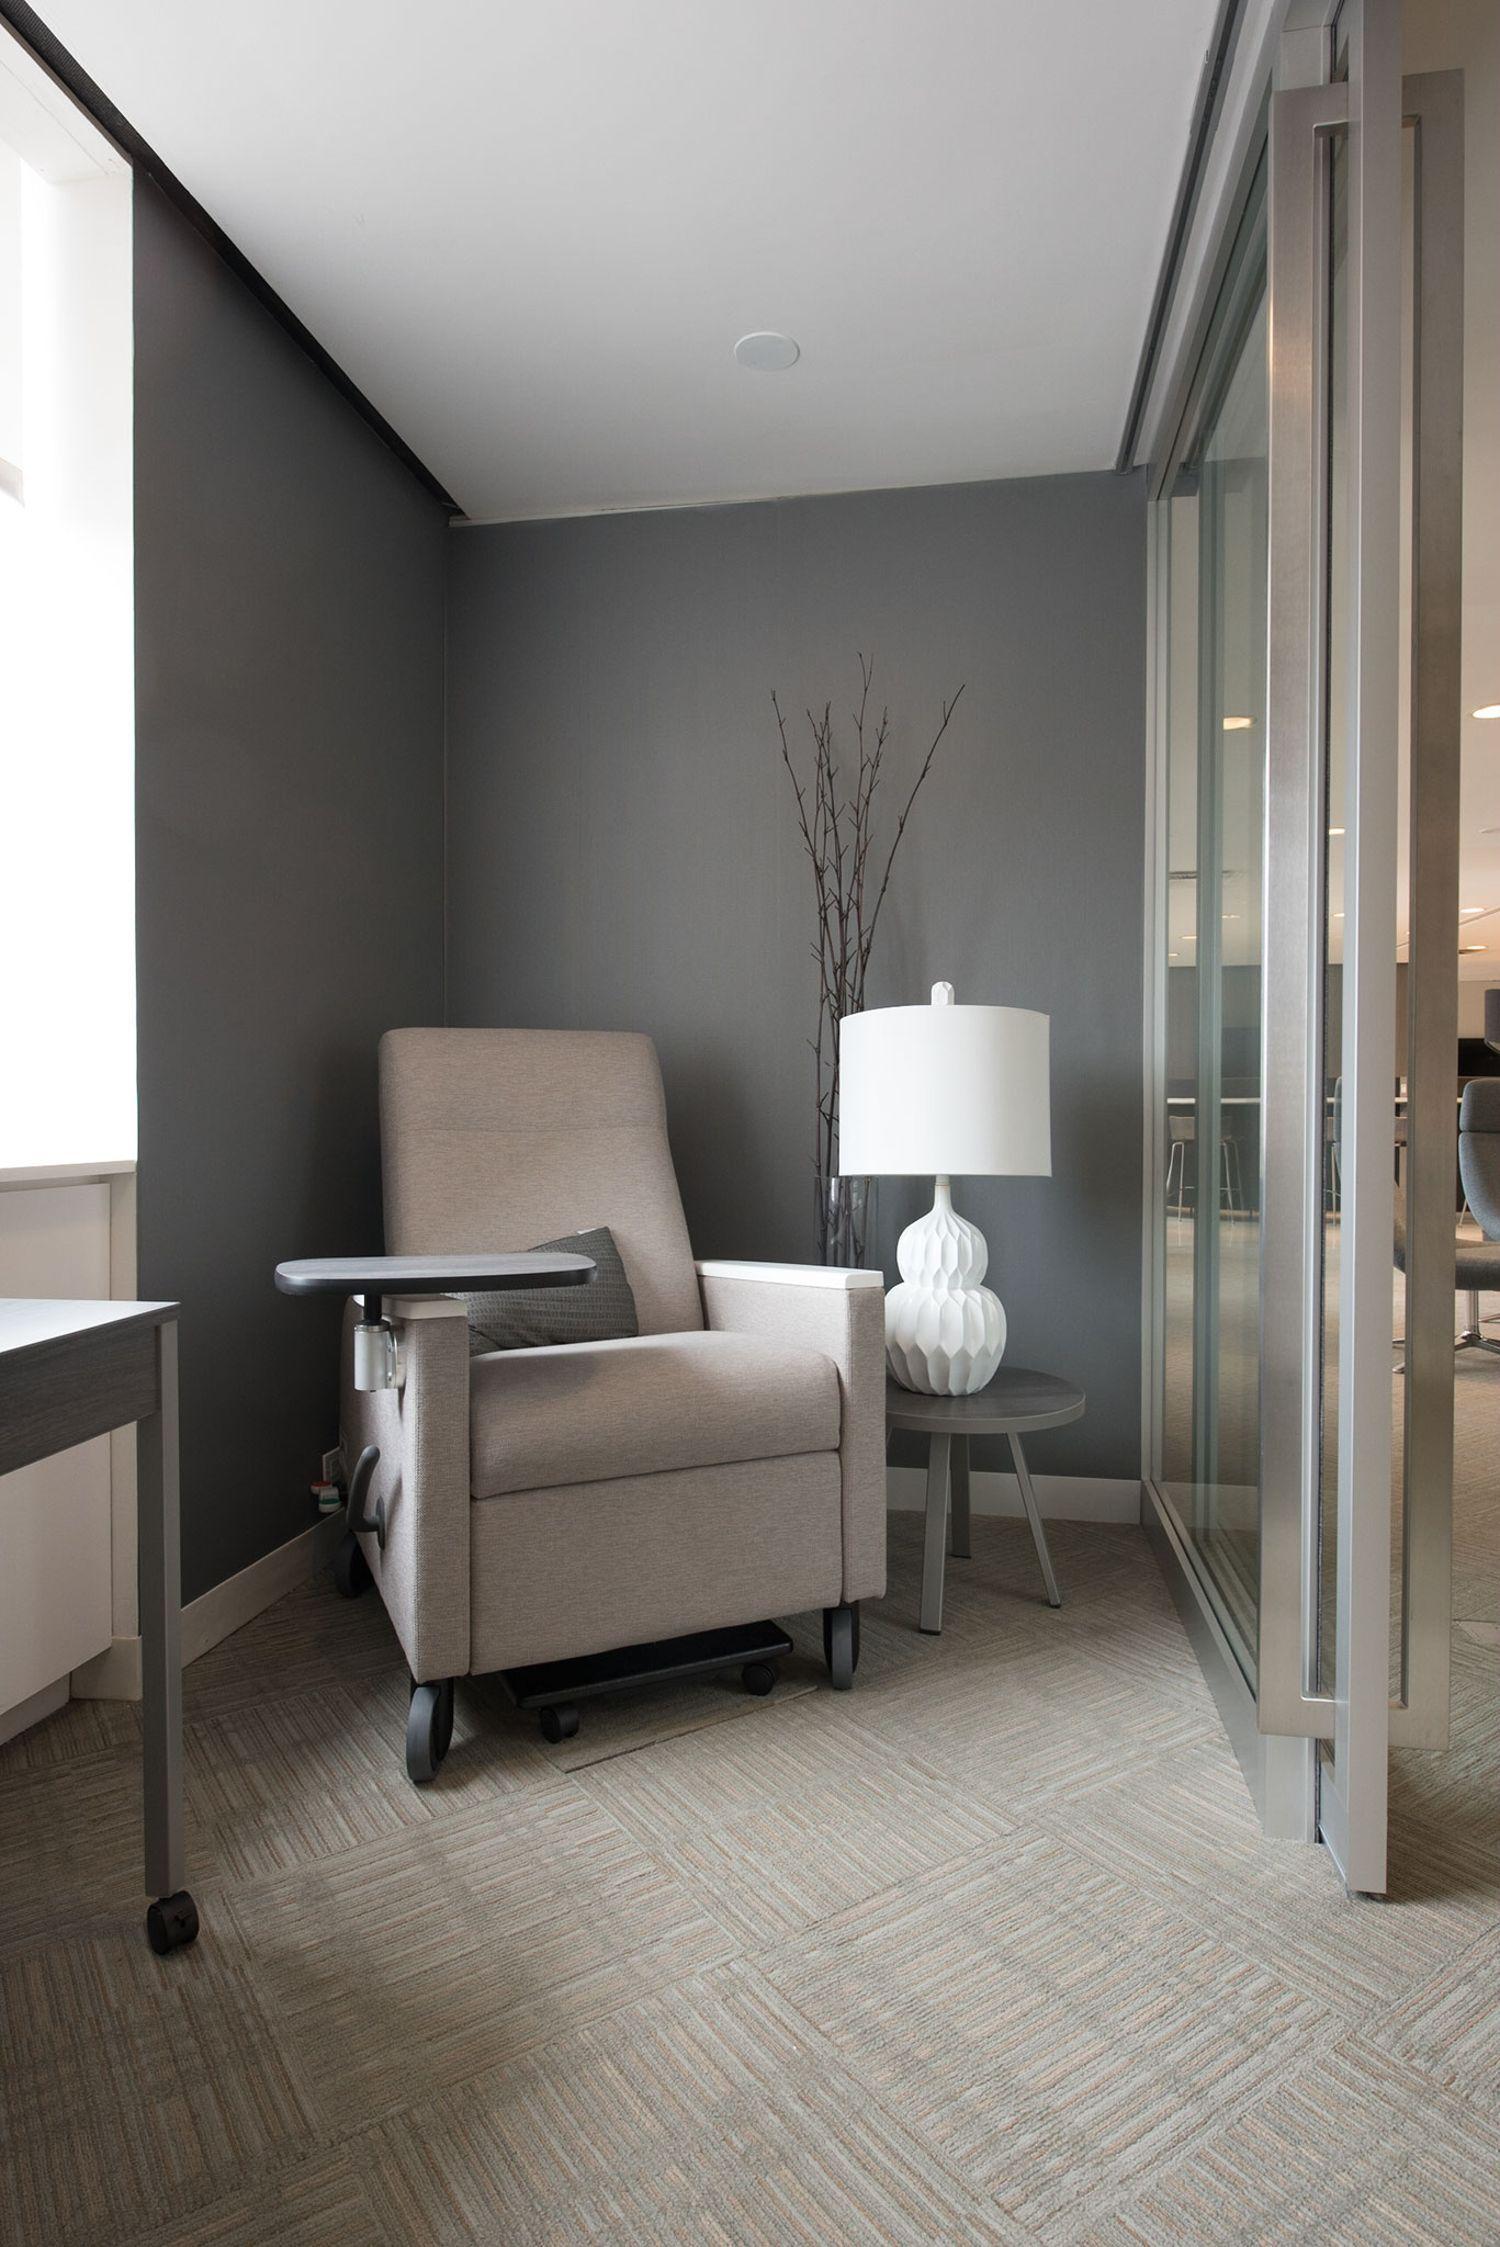 Patient Room Design: Healthcare Furniture Jacksonville, FL